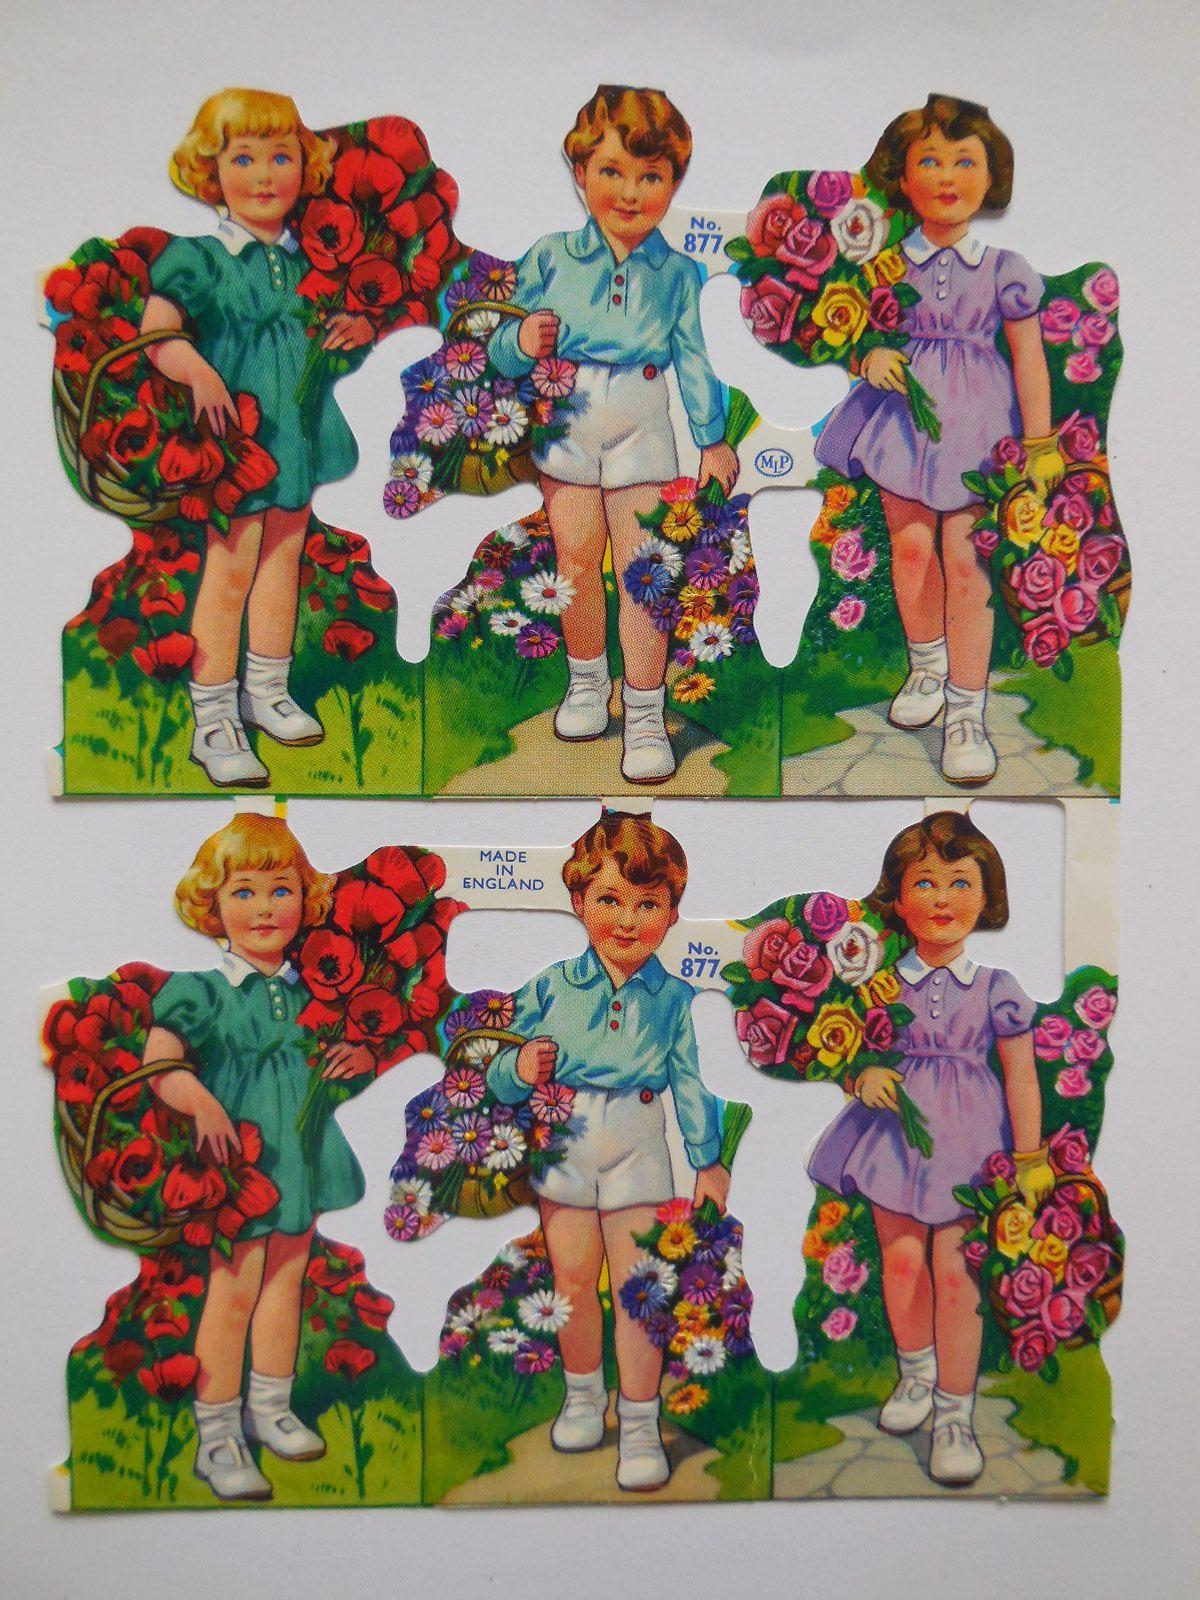 PZB VINTAGE PLAY CHILDREN  SCRAP GERMAN COLLAGE PAPER